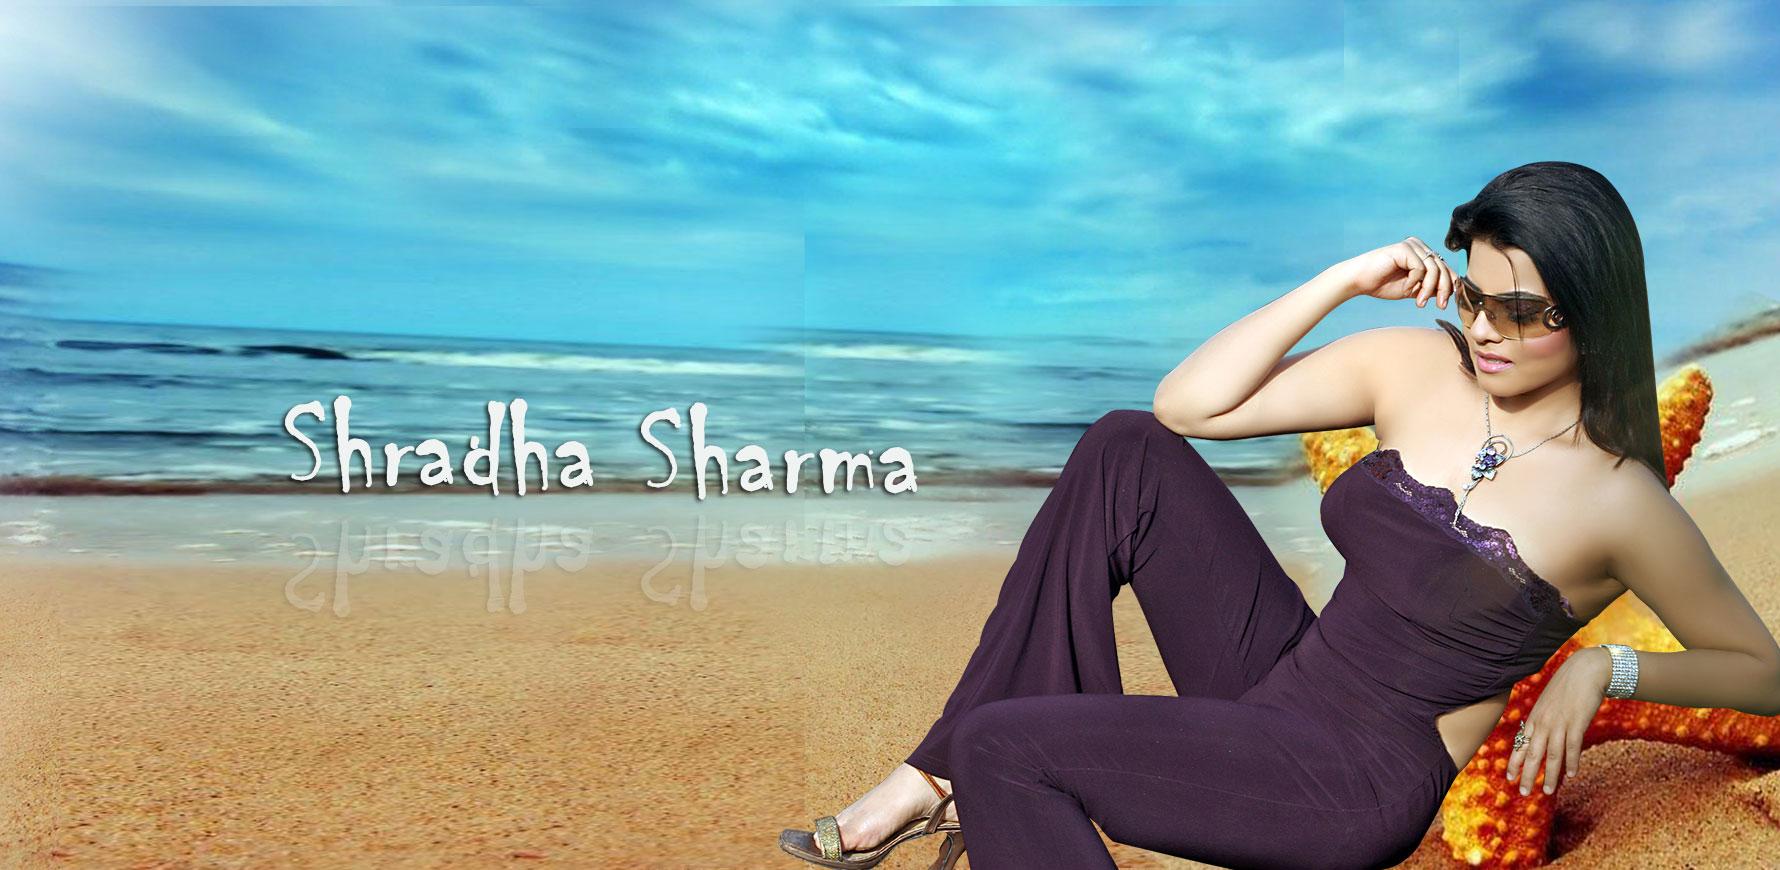 http://www.shradhasharma.com/wp-content/uploads/2017/07/banner-new-6.jpg